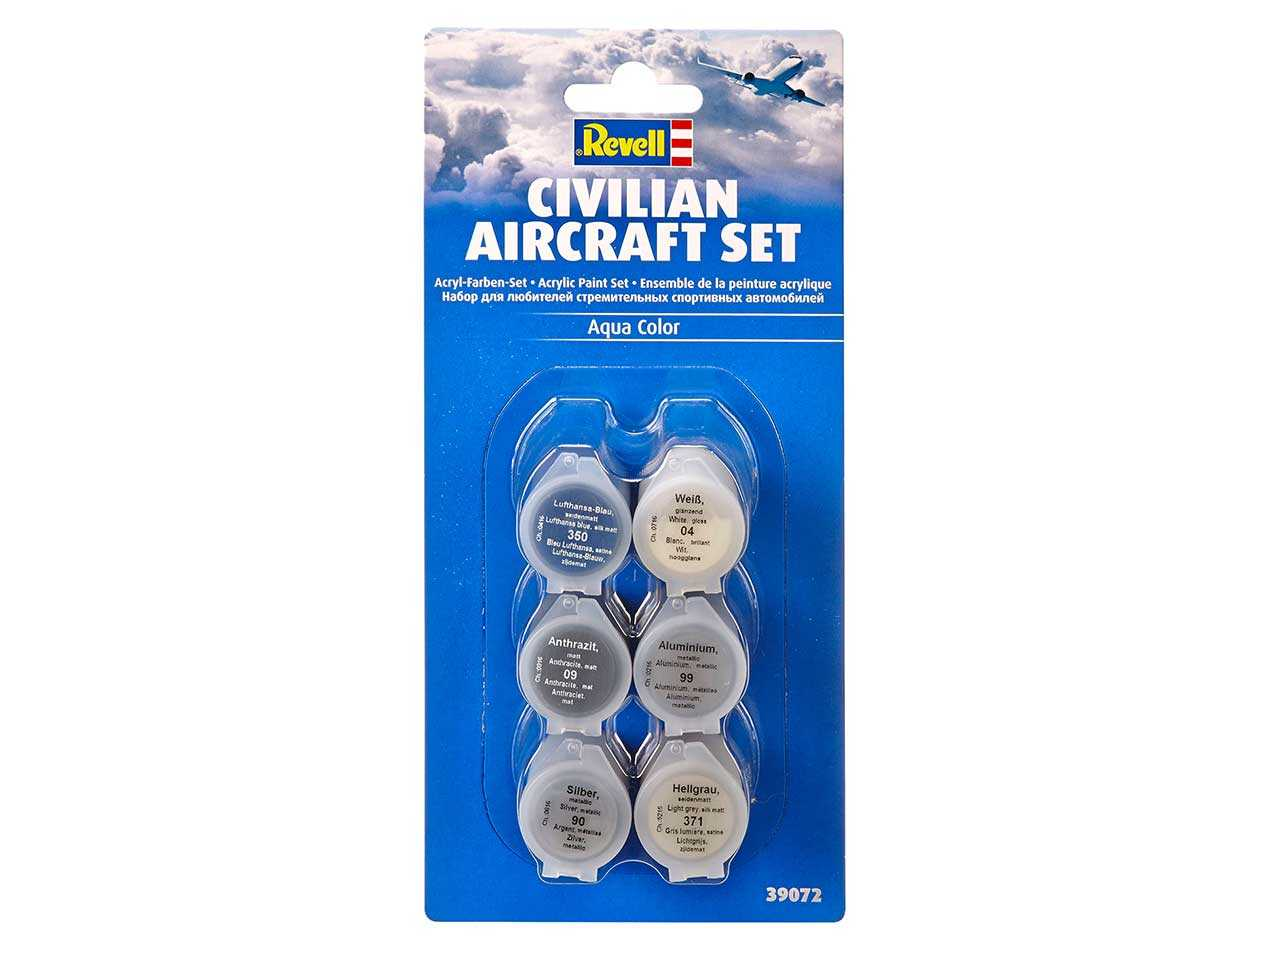 CIVILIAN AIRCRAFT SET